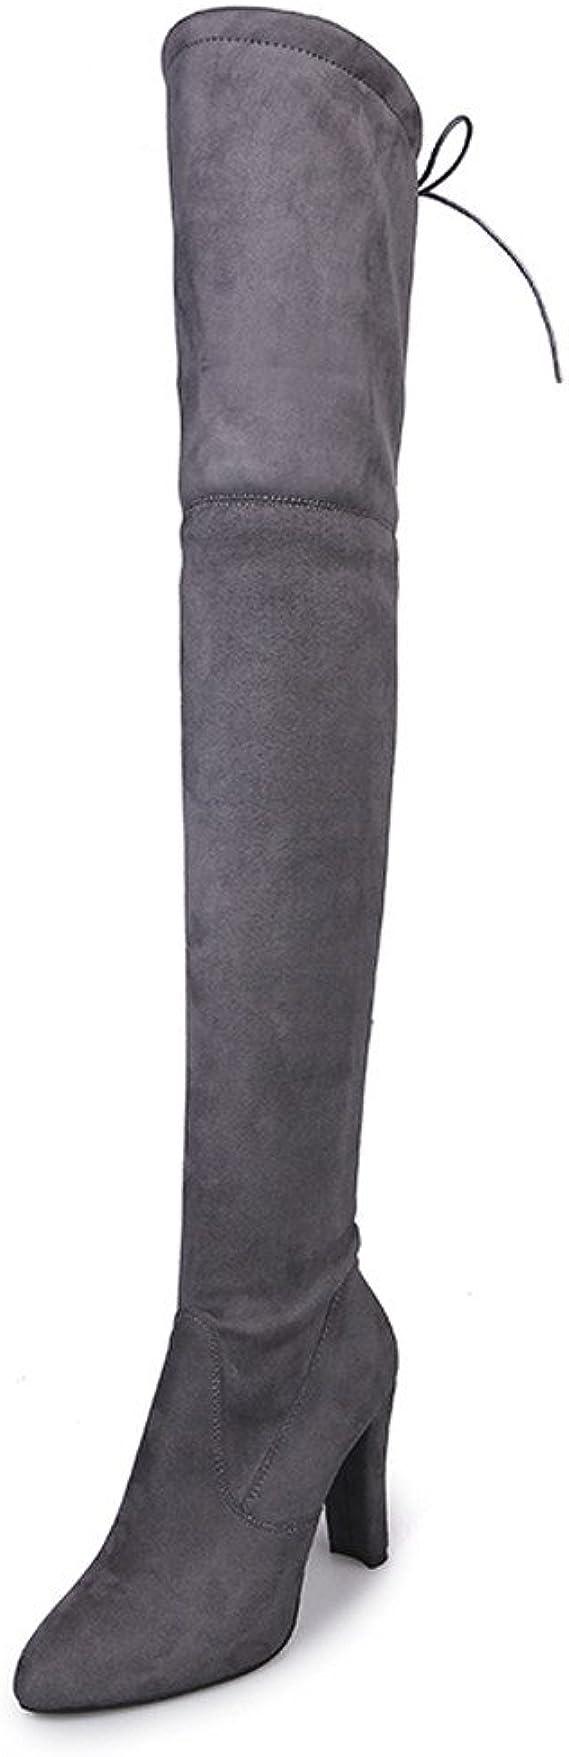 Women Winter Thigh High Boots Flat Heel Over the Knee Slim Leg Round Toe Booties